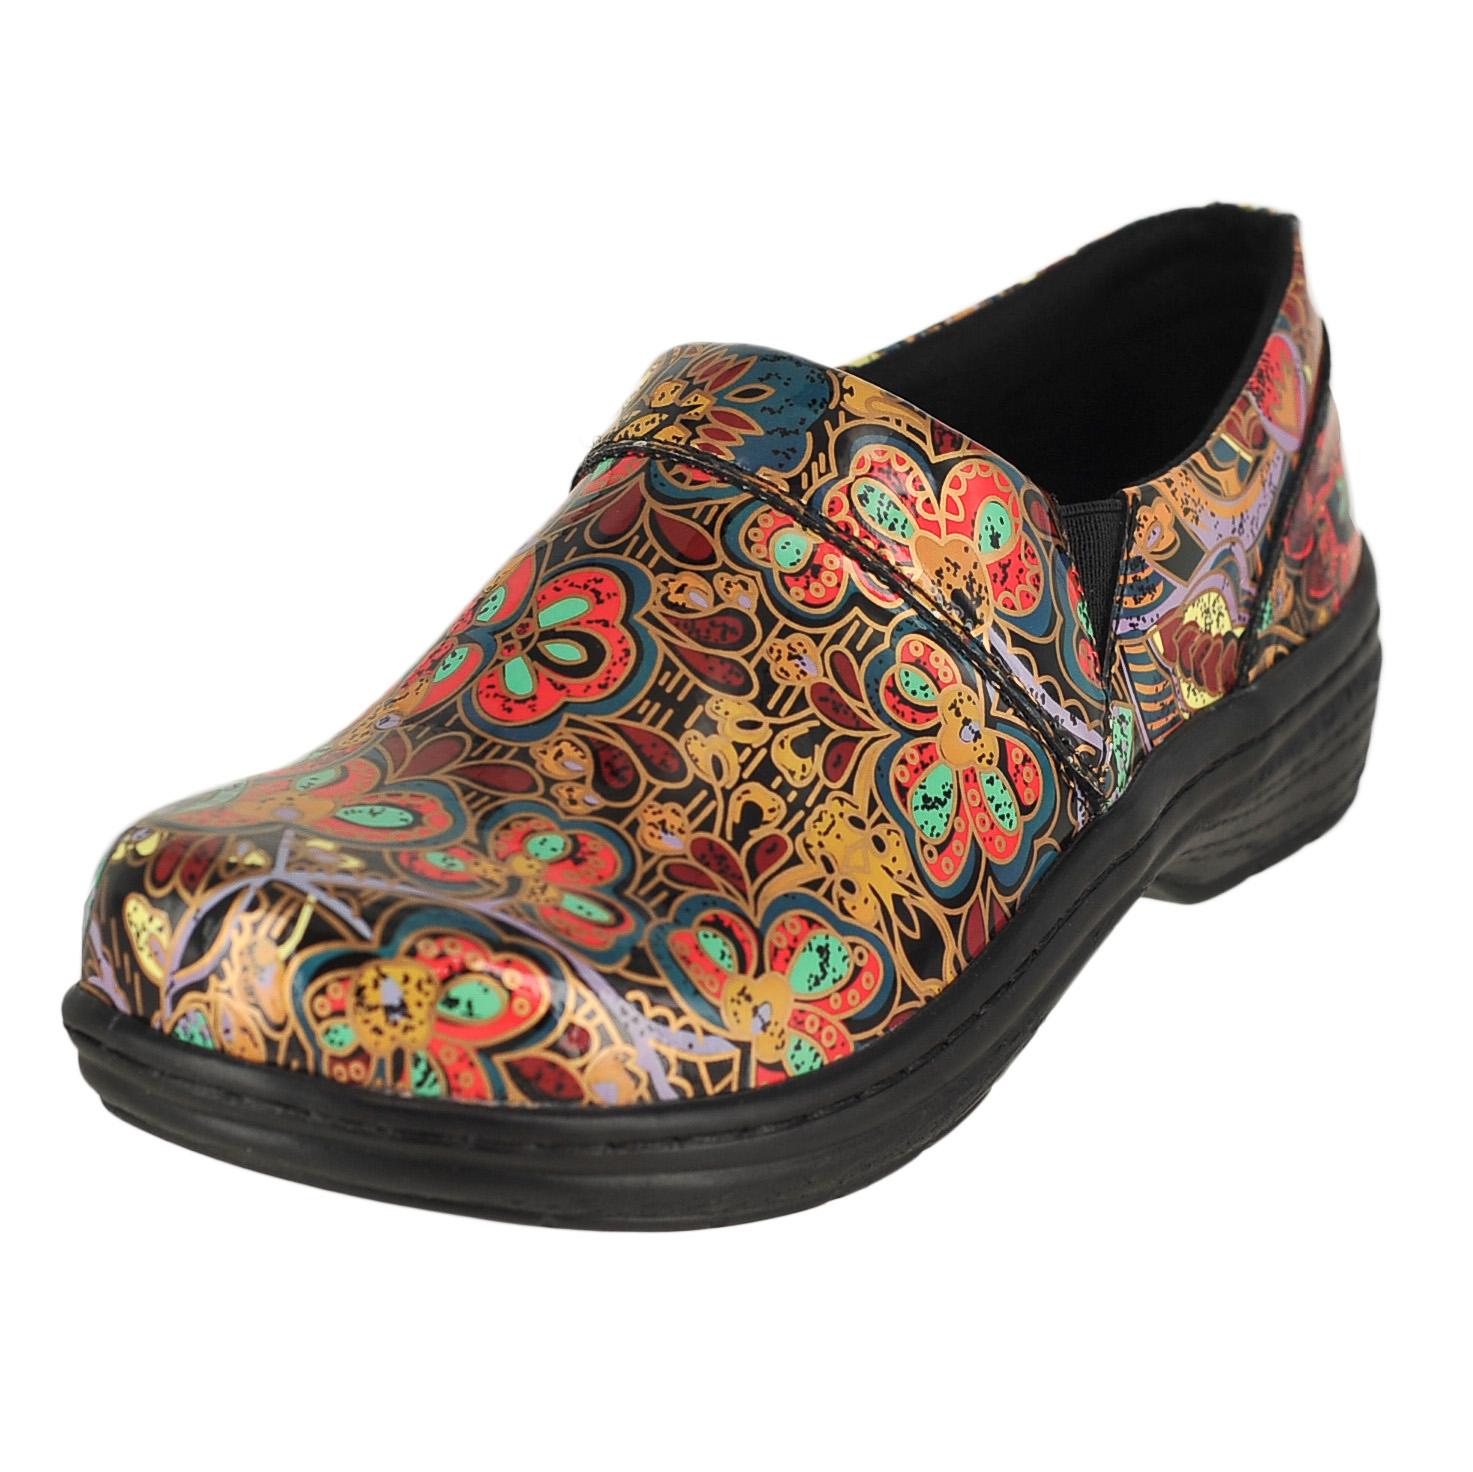 Amazon Warehouse Womens Shoes